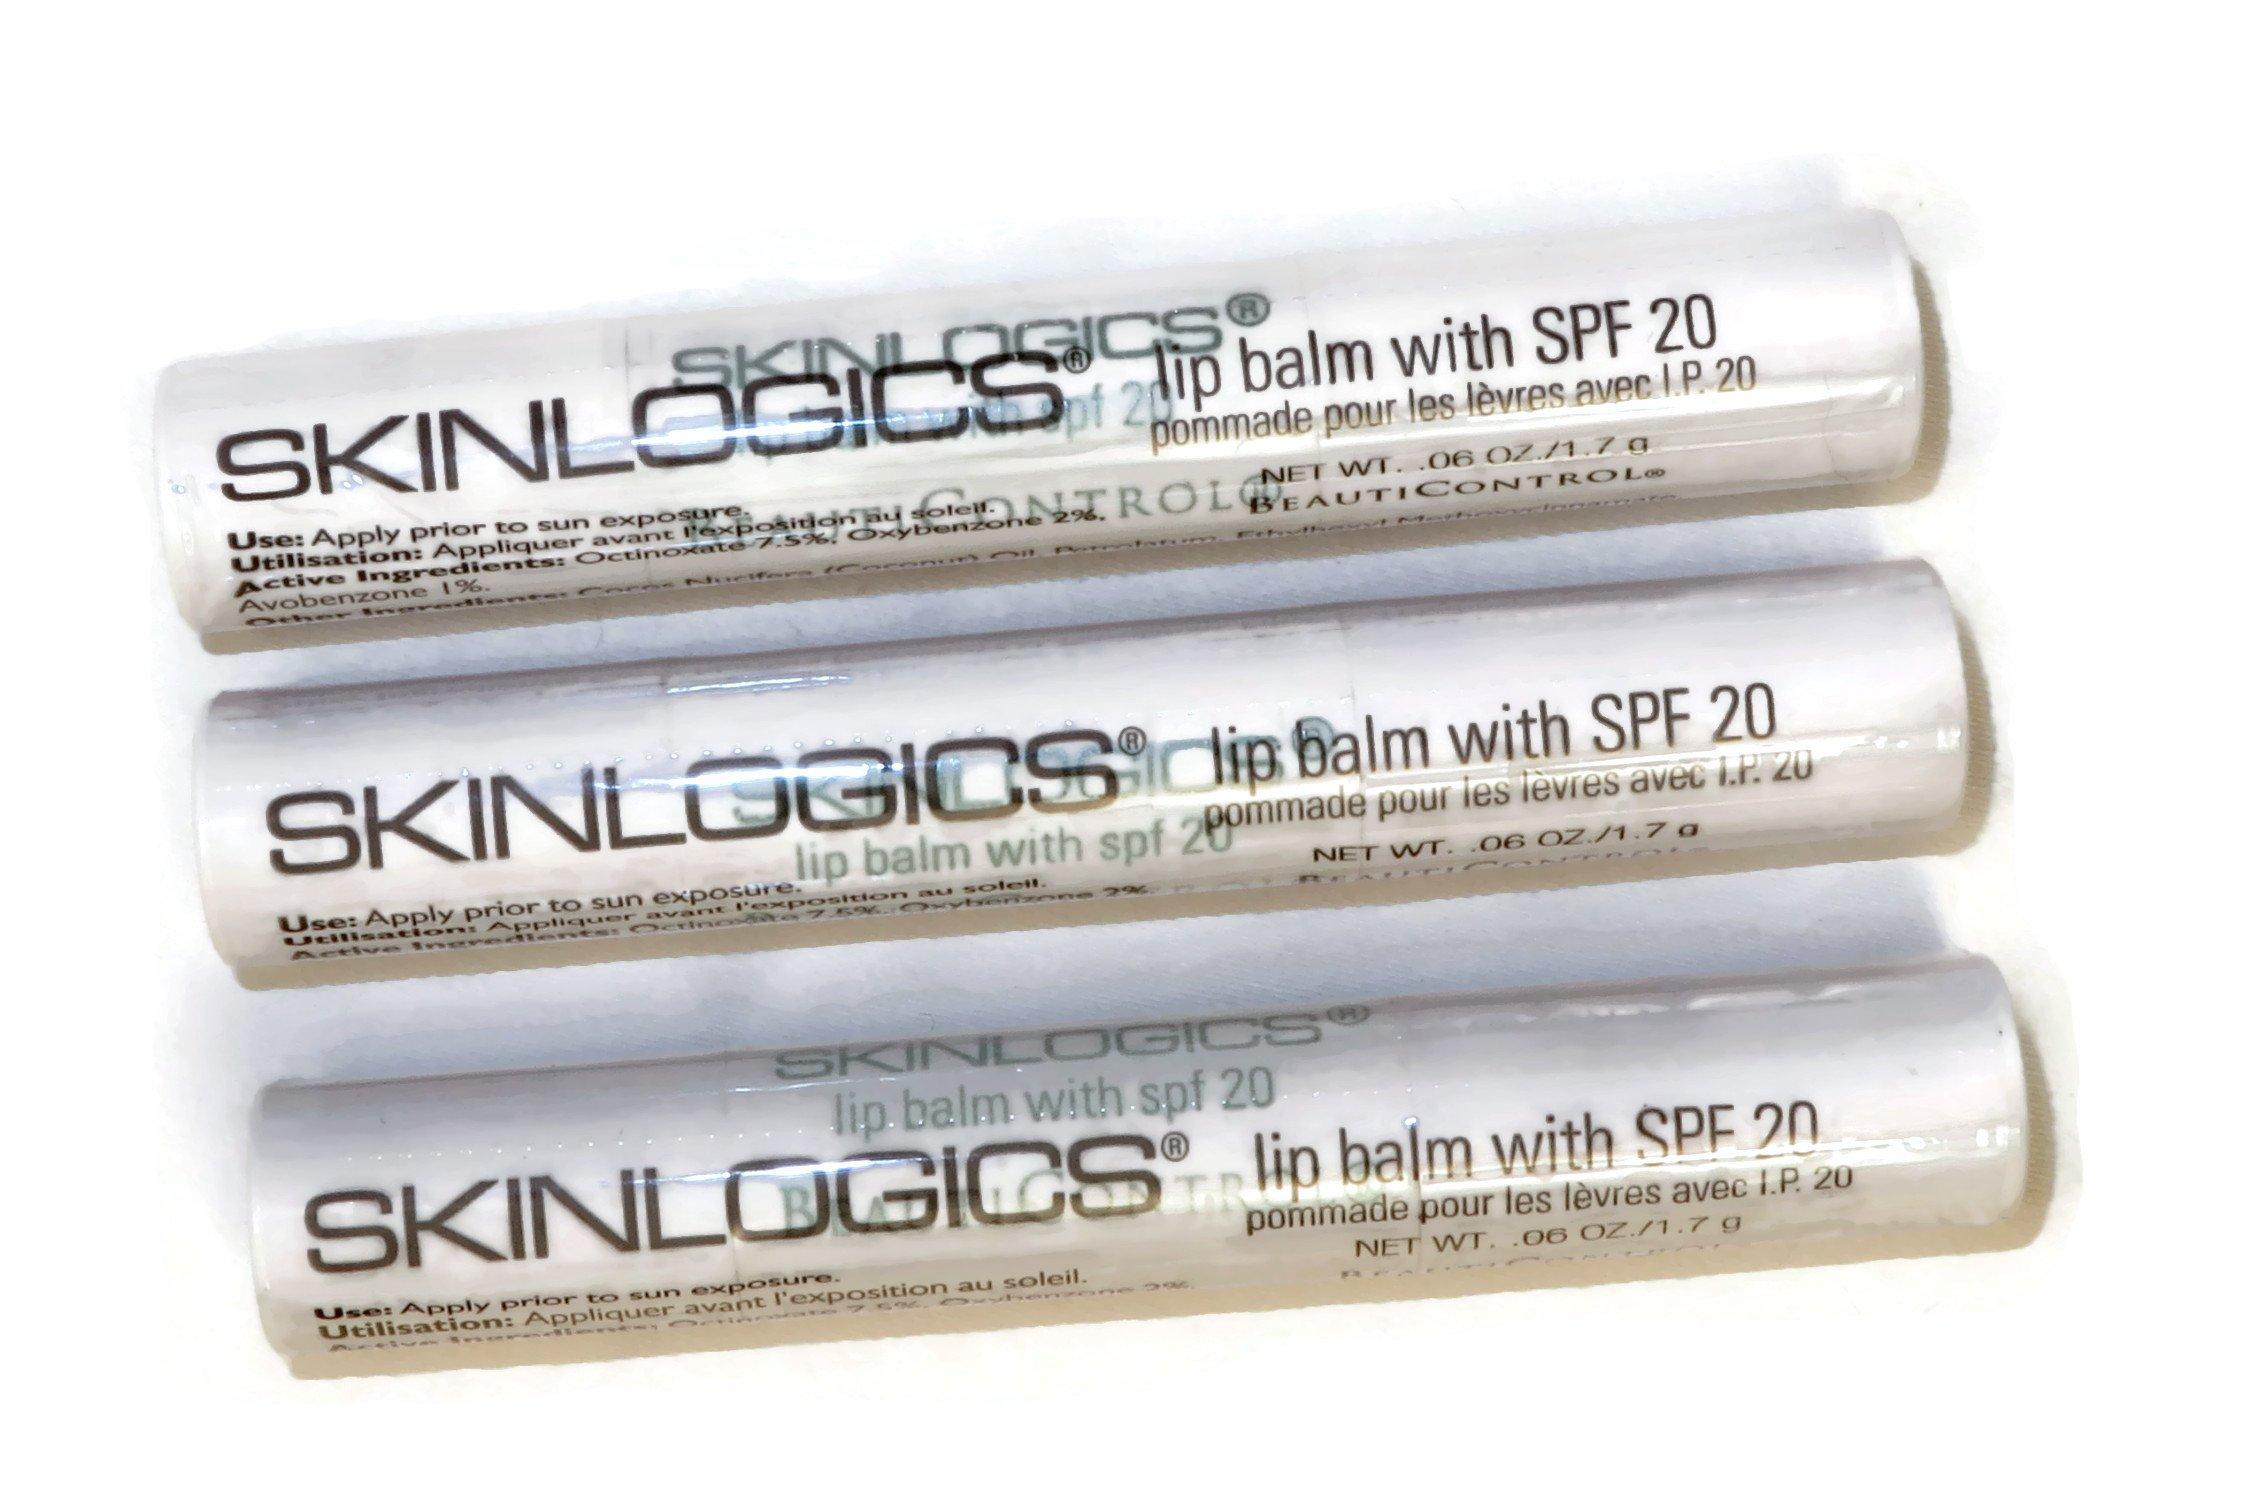 Amazon.com : Beauticontrol Skinlogics Lip Balm : Beauty